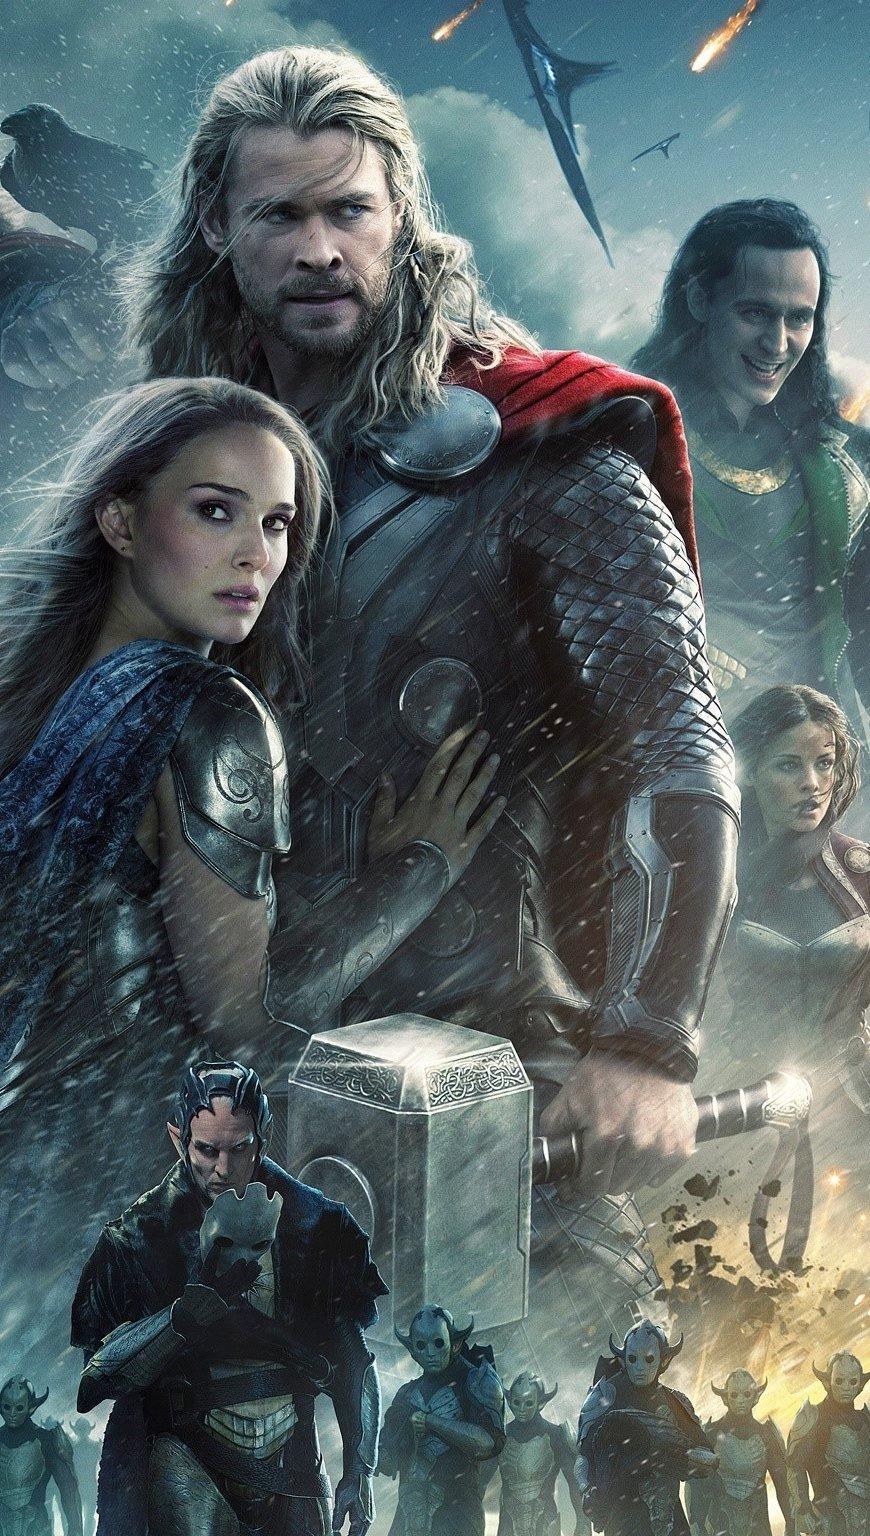 Wallpaper Thor 2 The dark world Vertical